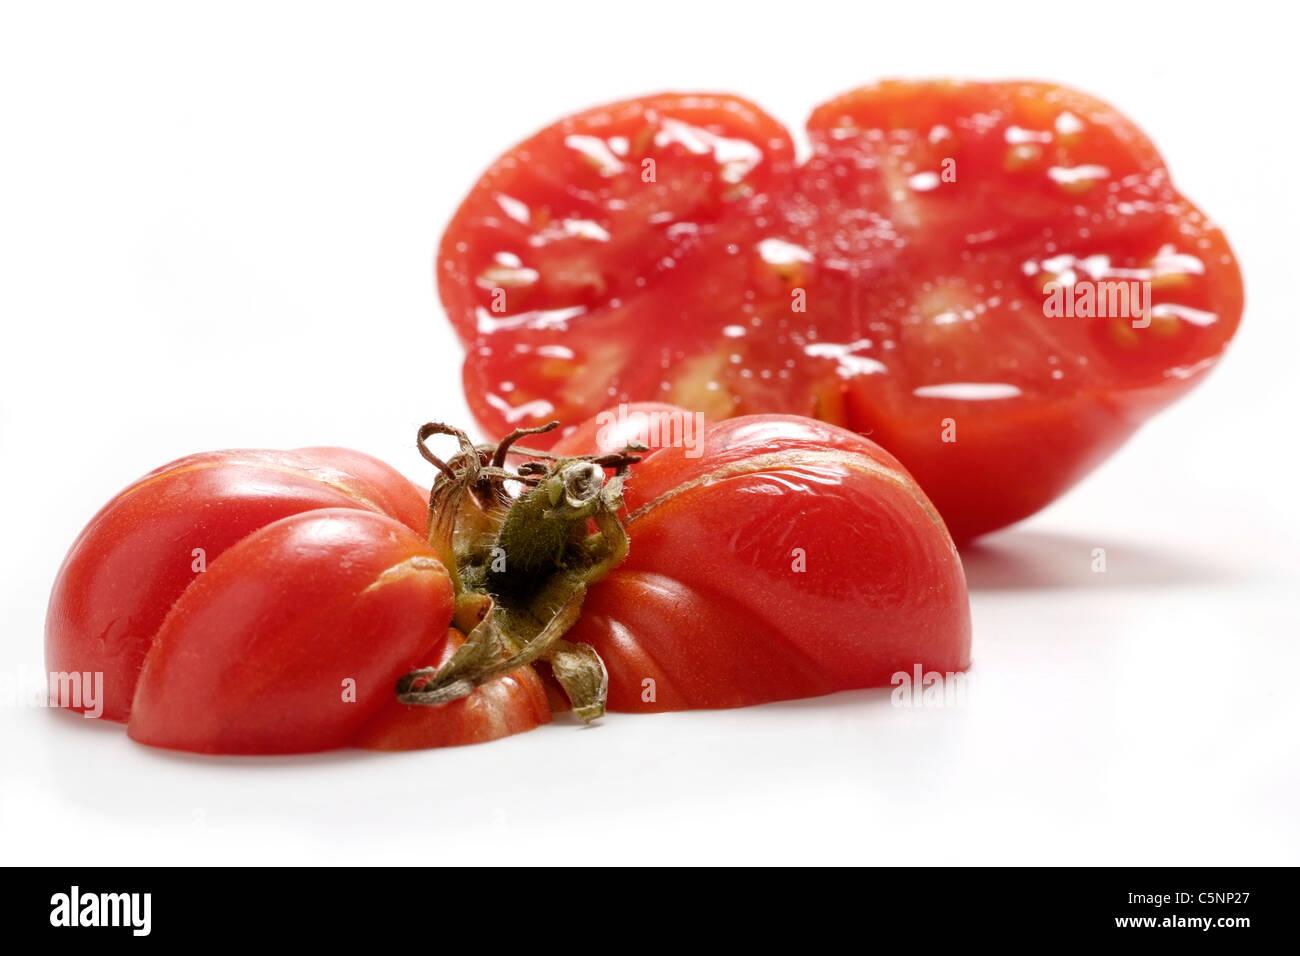 Tomato varieties:  Reisetomate Zorn, two halves - Stock Image